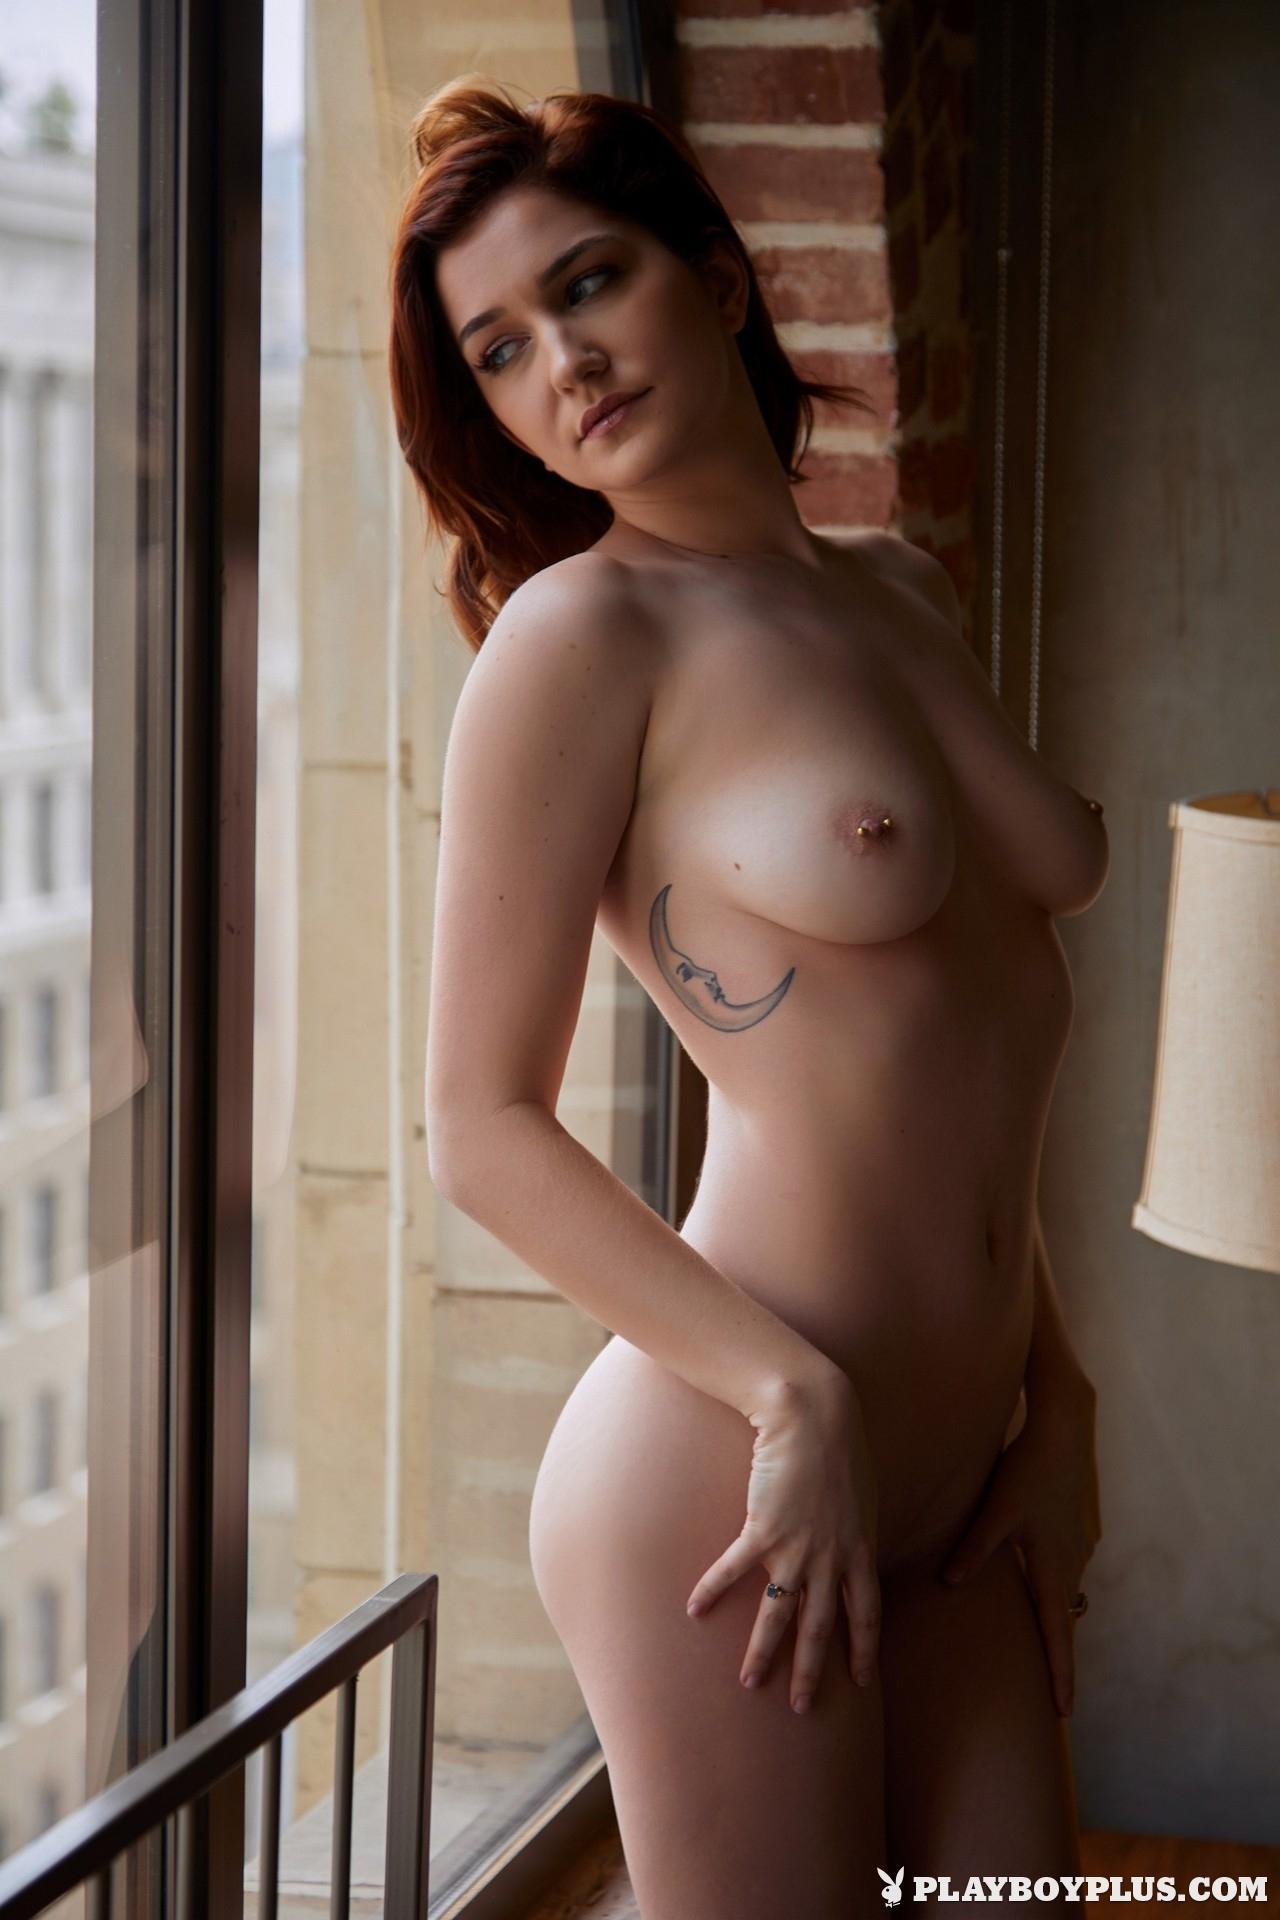 Skye Blue In Casual Chic Playboy Plus (26)